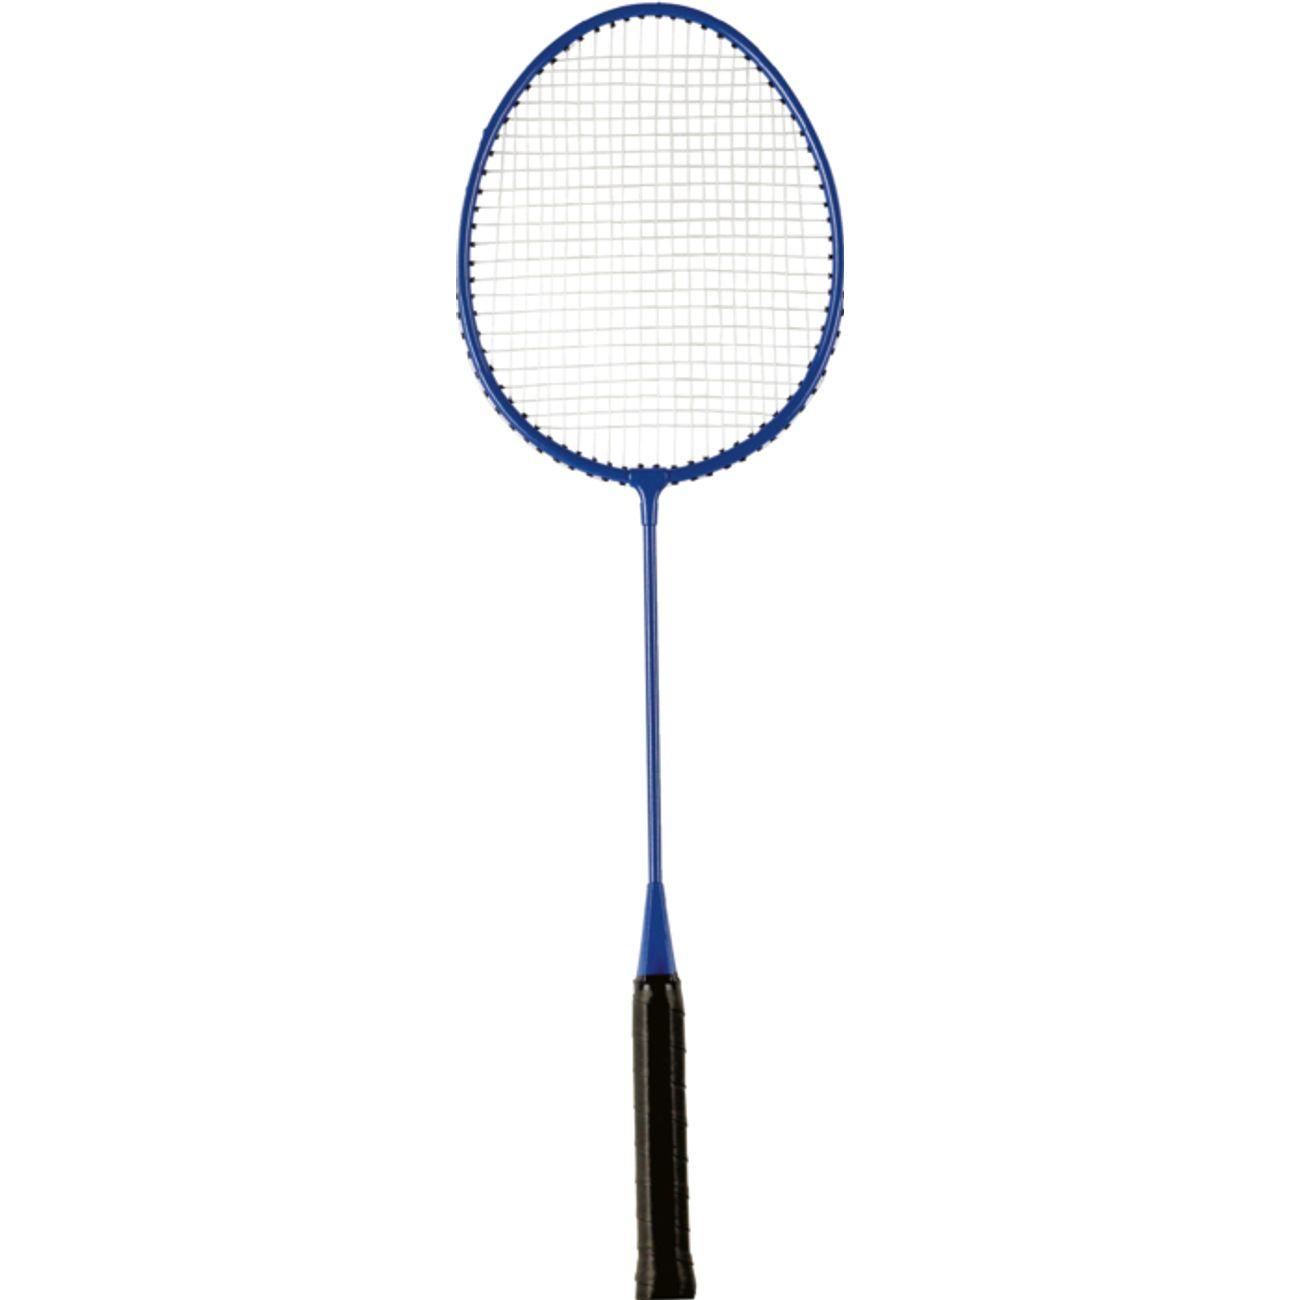 RAQUETTE Badminton adulte 1ER PRIX RAQUETTE DE BADMINTON